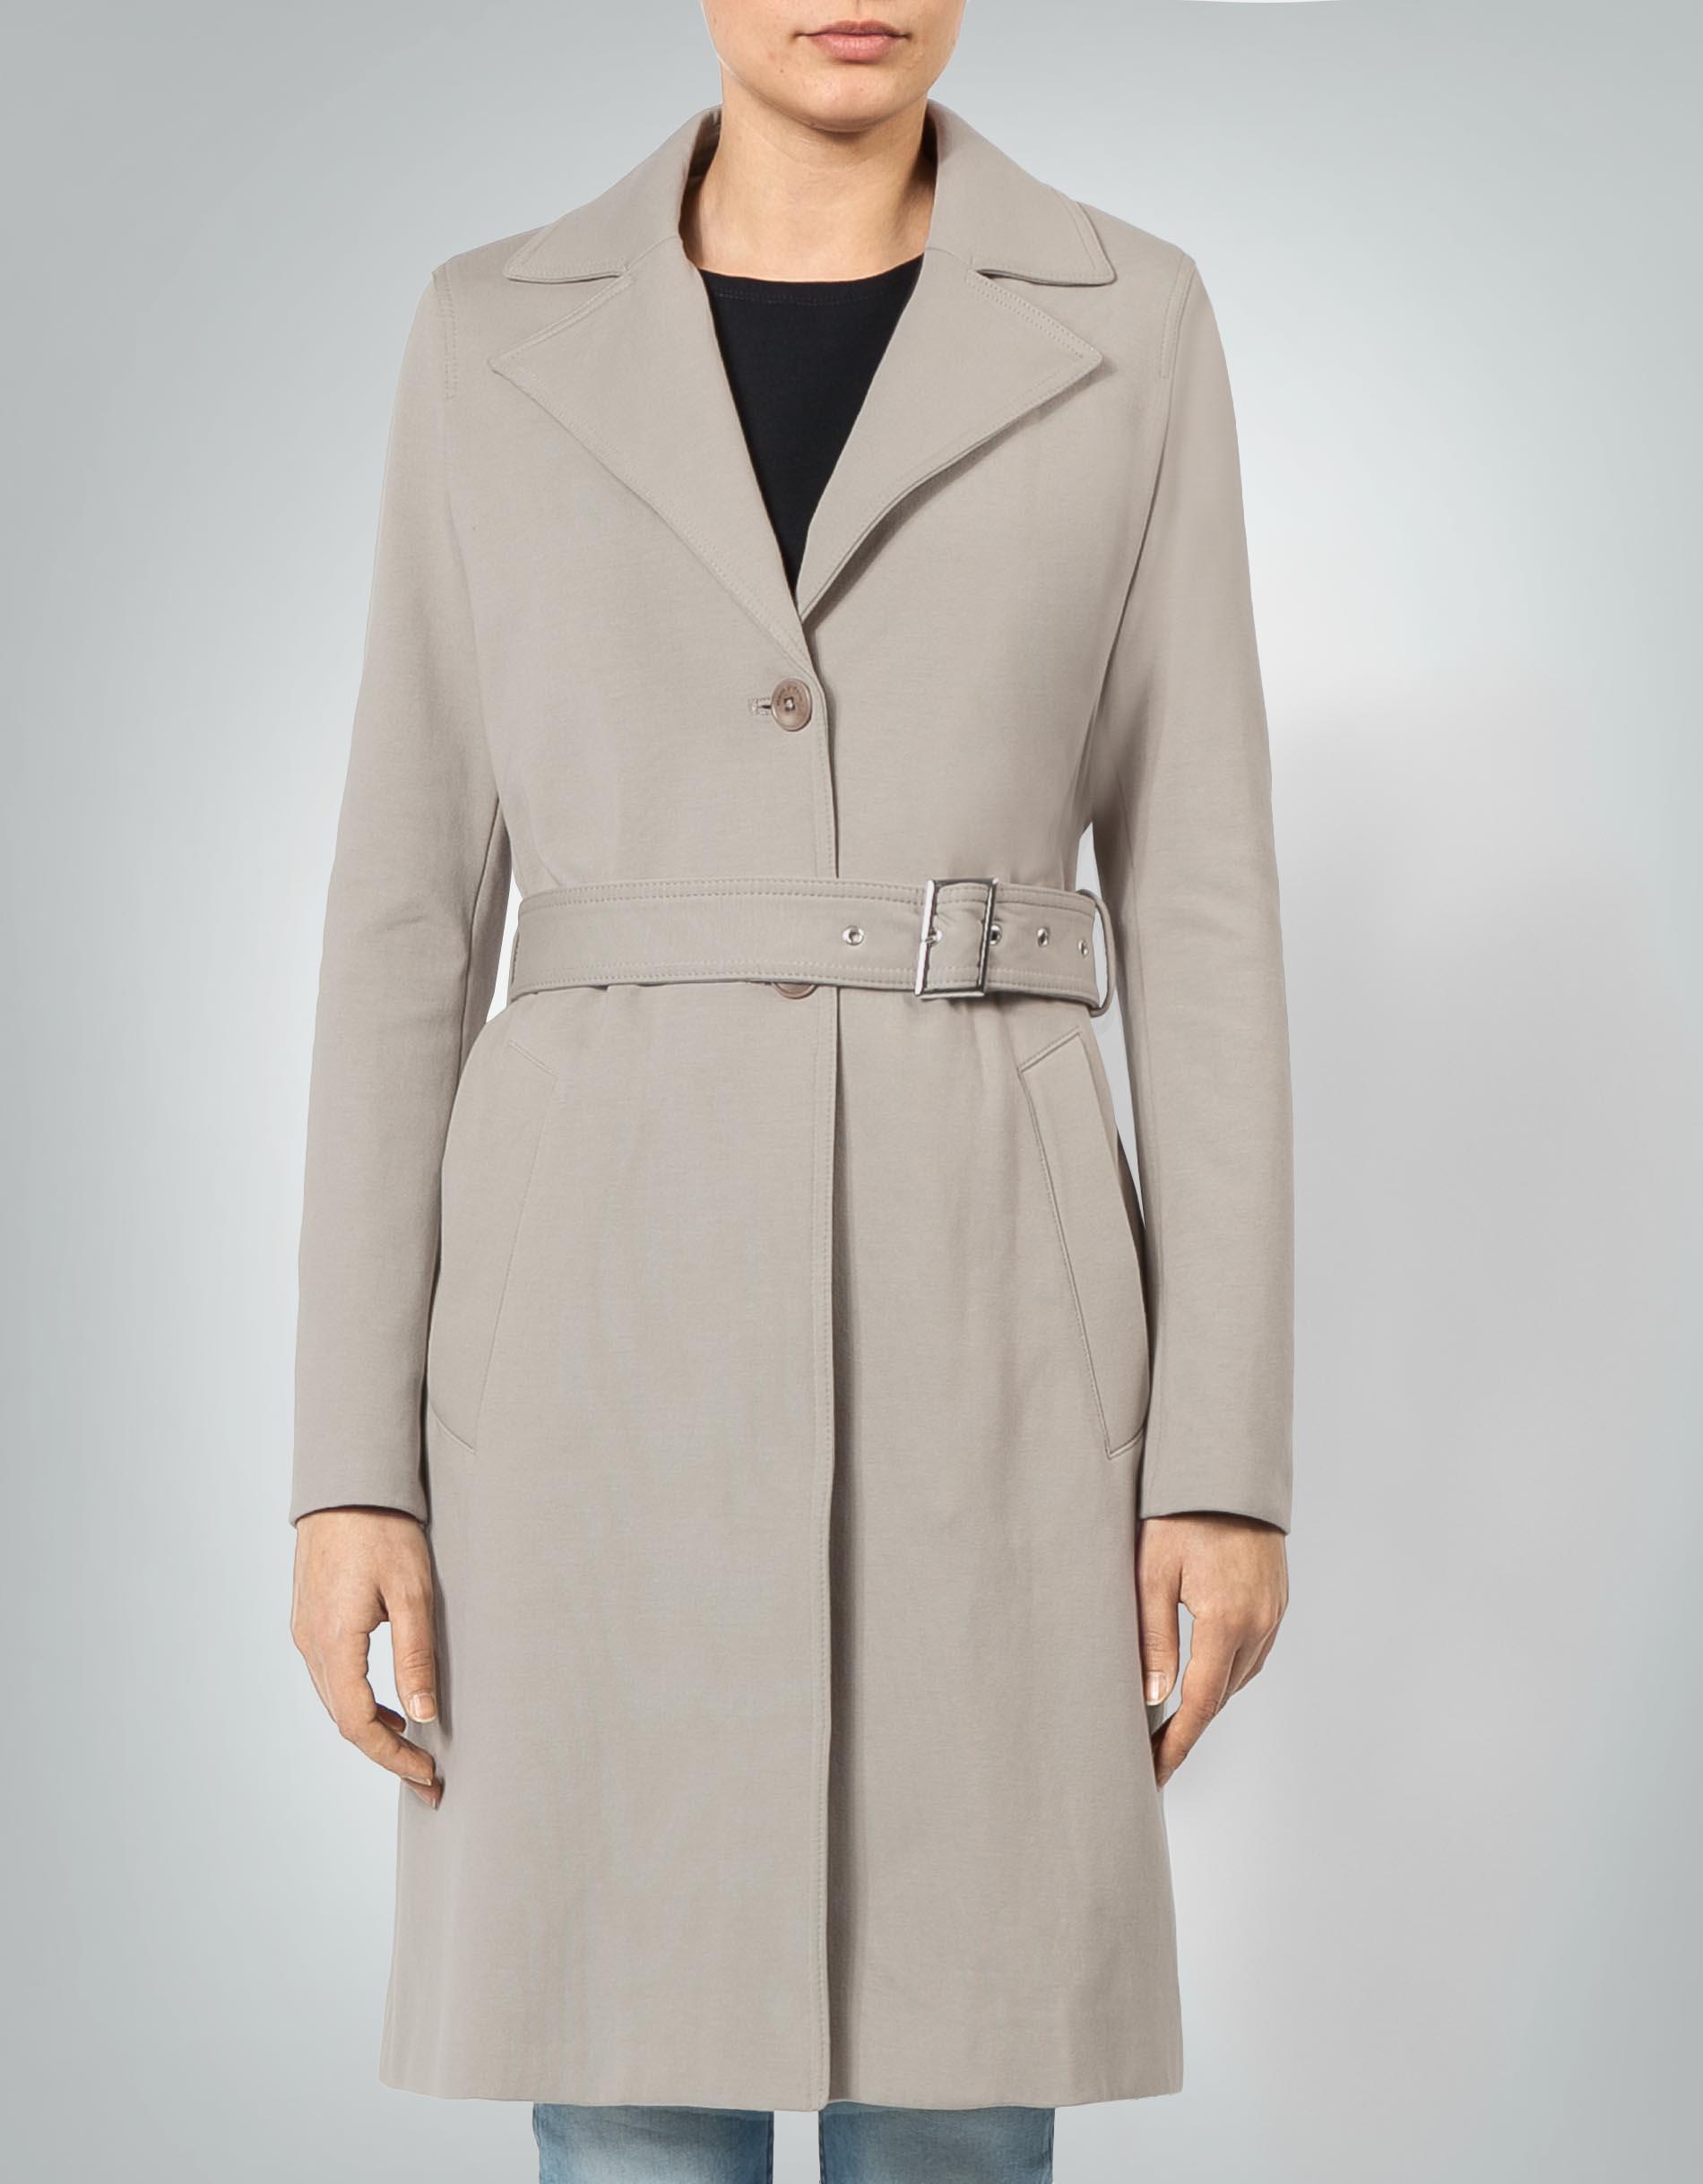 designer fashion ce96d 499c2 Marc O'Polo Damen Mantel Trenchcoat aus Heavy Jersey ...